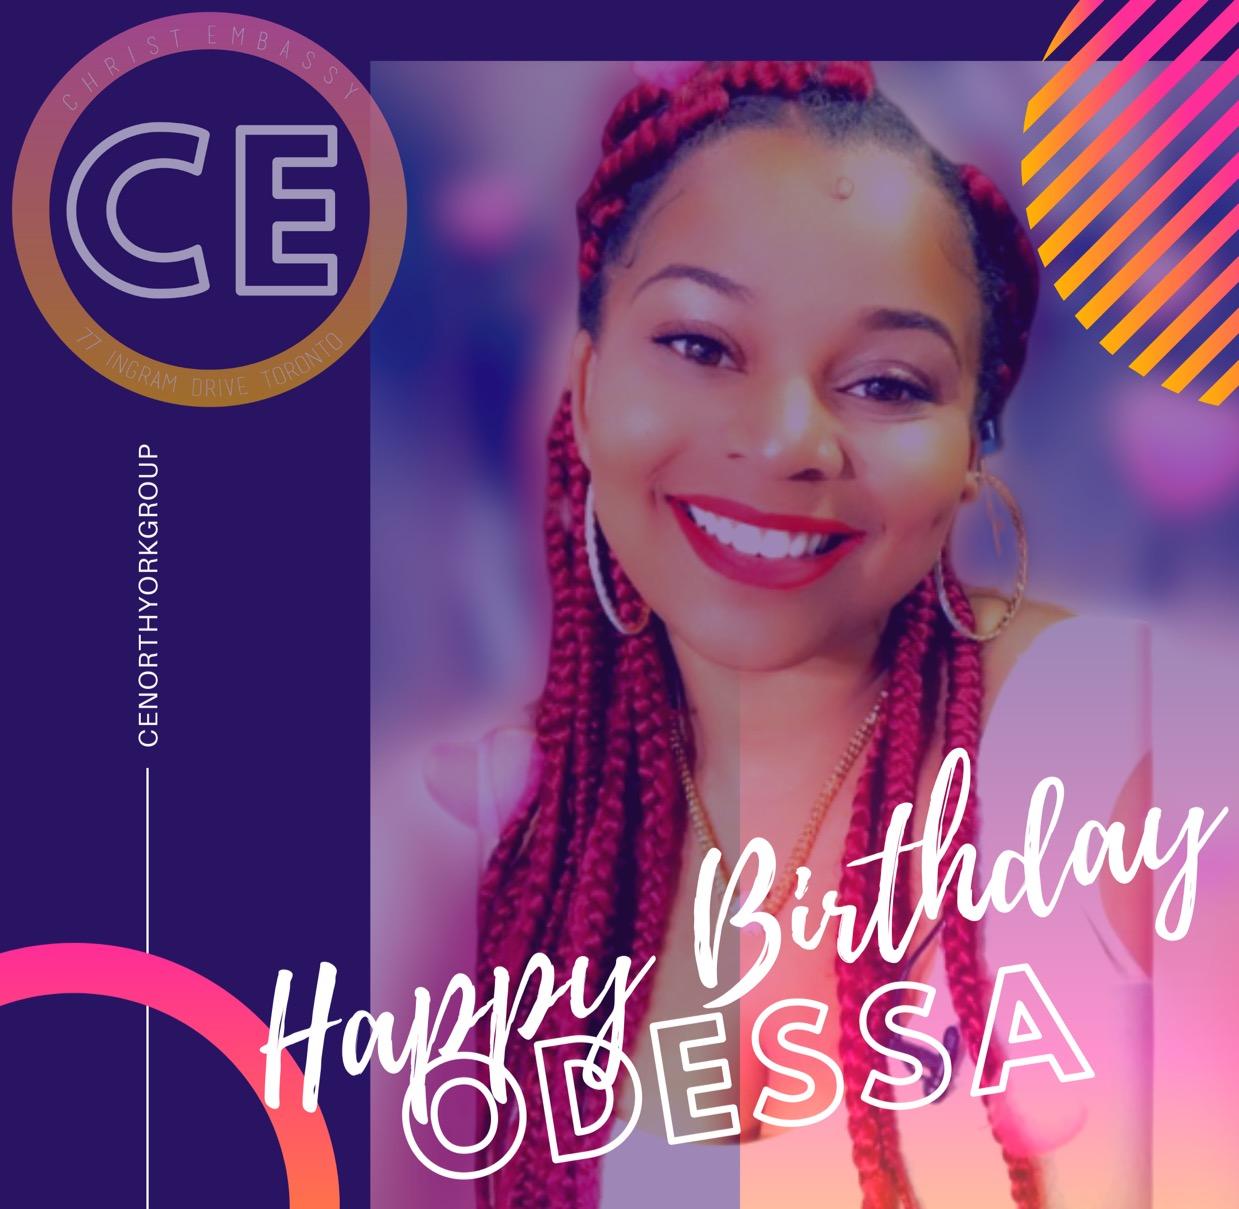 Happy Birthday dearest Sis Odessa!